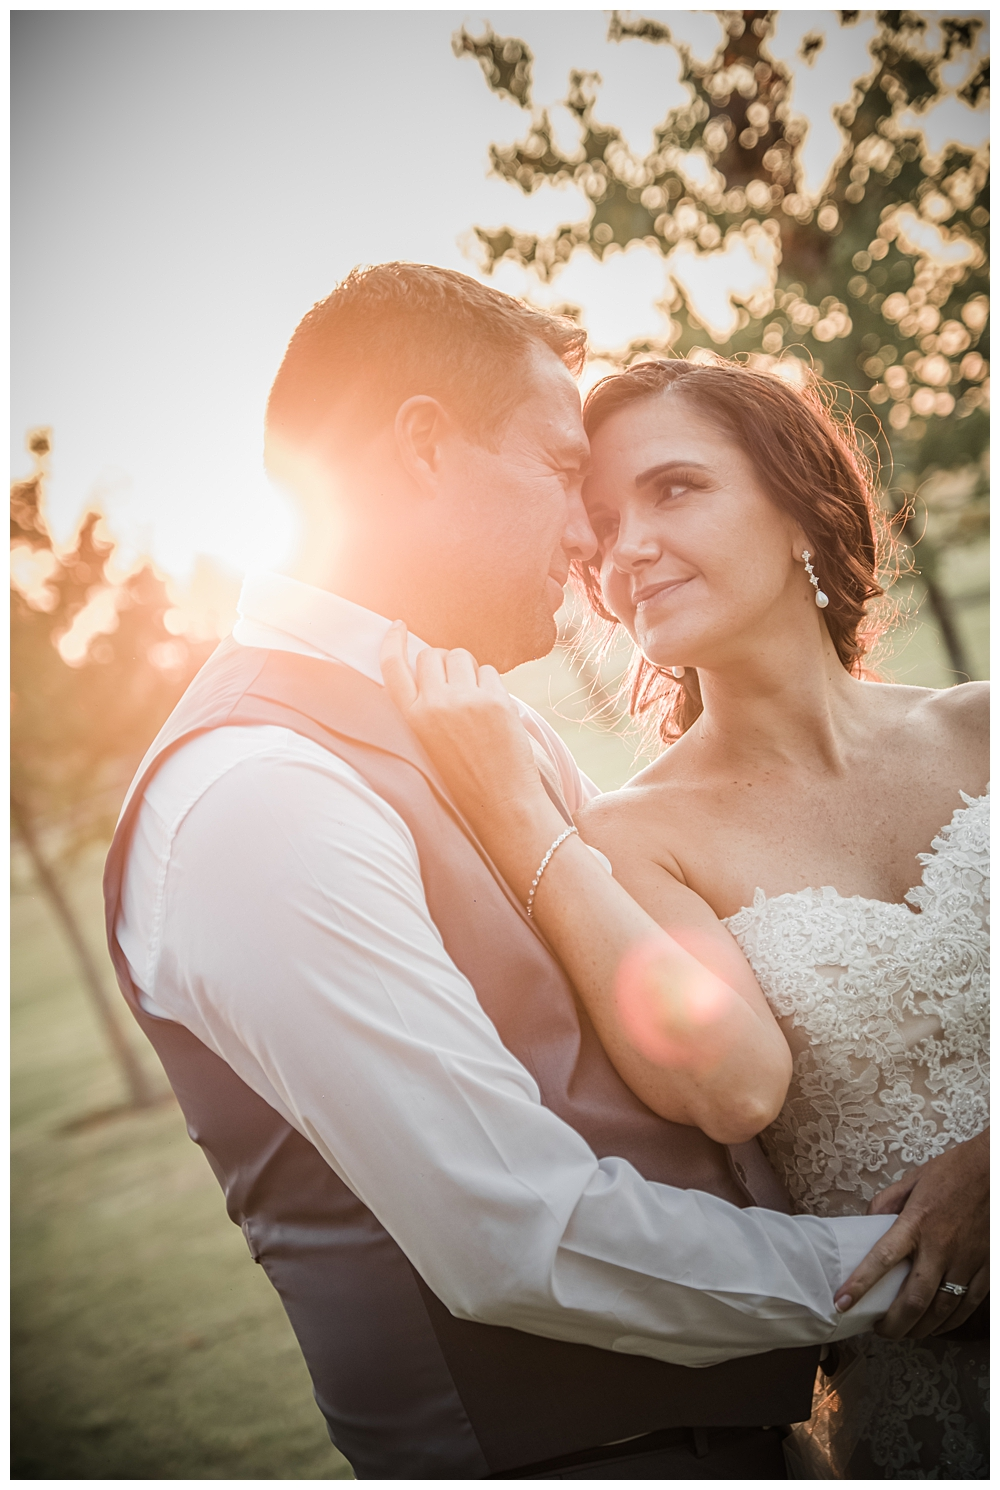 Best_Wedding_Photographer_AlexanderSmith_1187.jpg